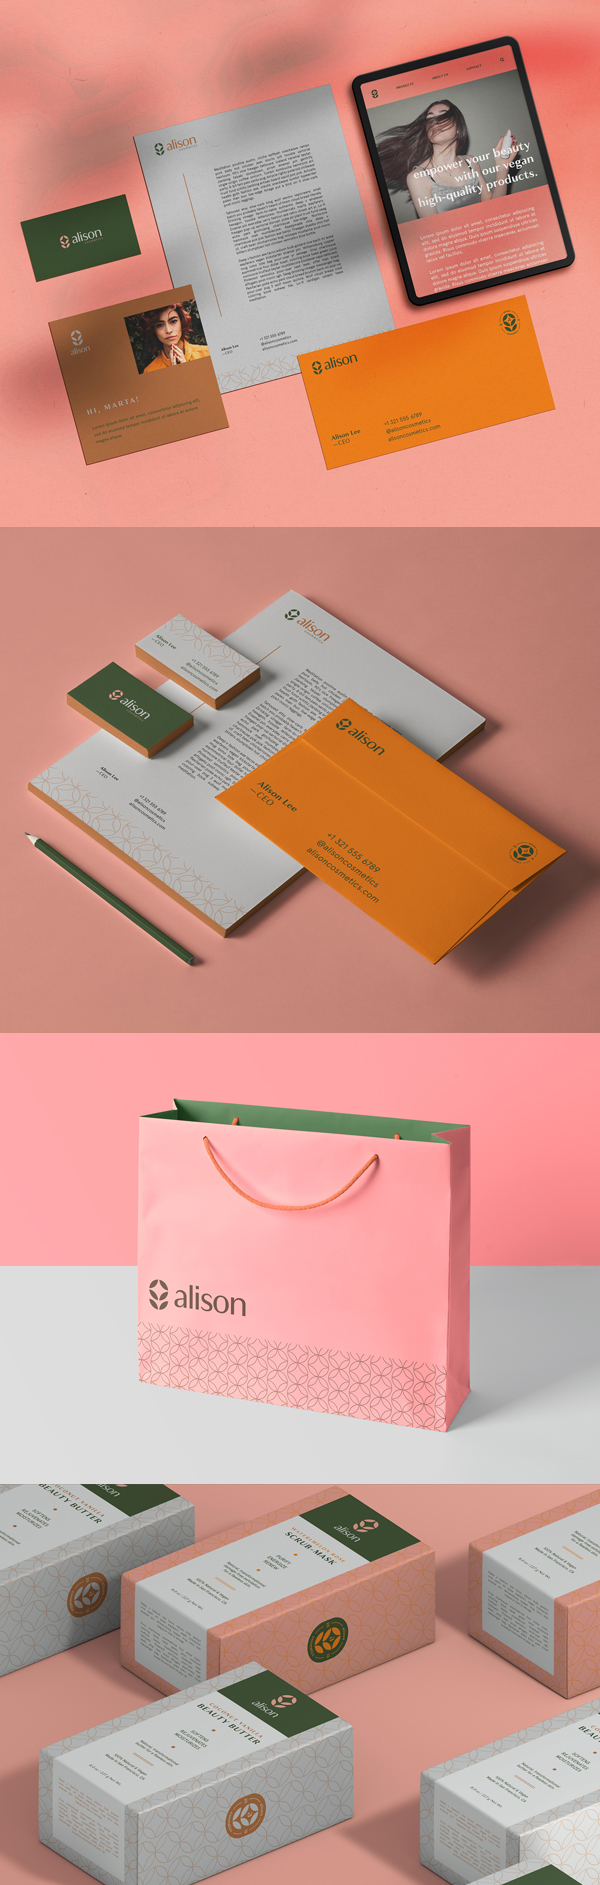 Stationery - Alison Cosmetics Branding Identity by Joao Matheus de Barros